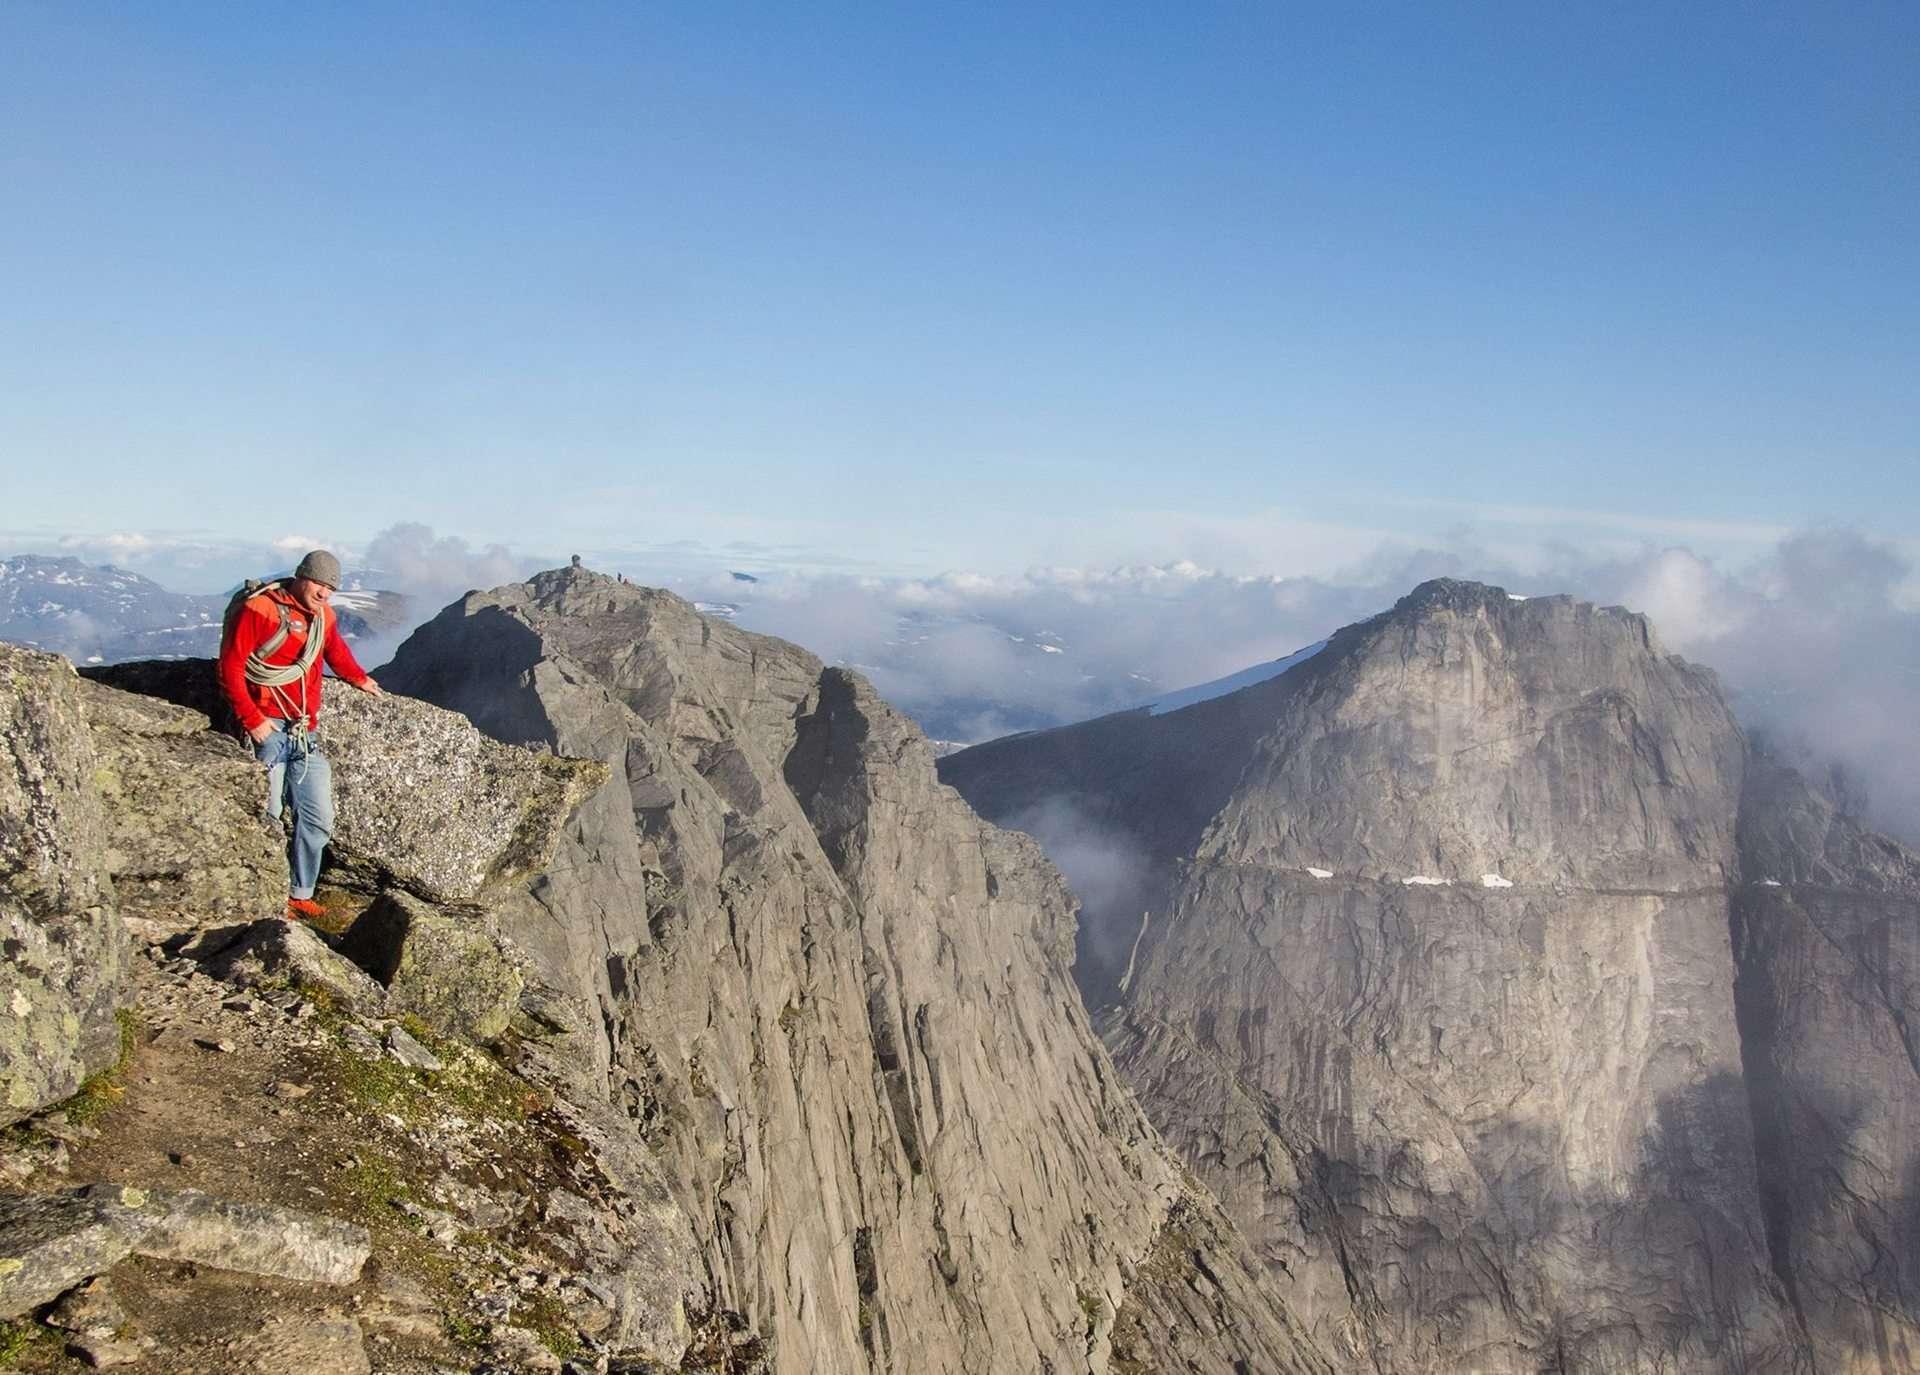 Magnus Lindor Strand, Mountain Guide